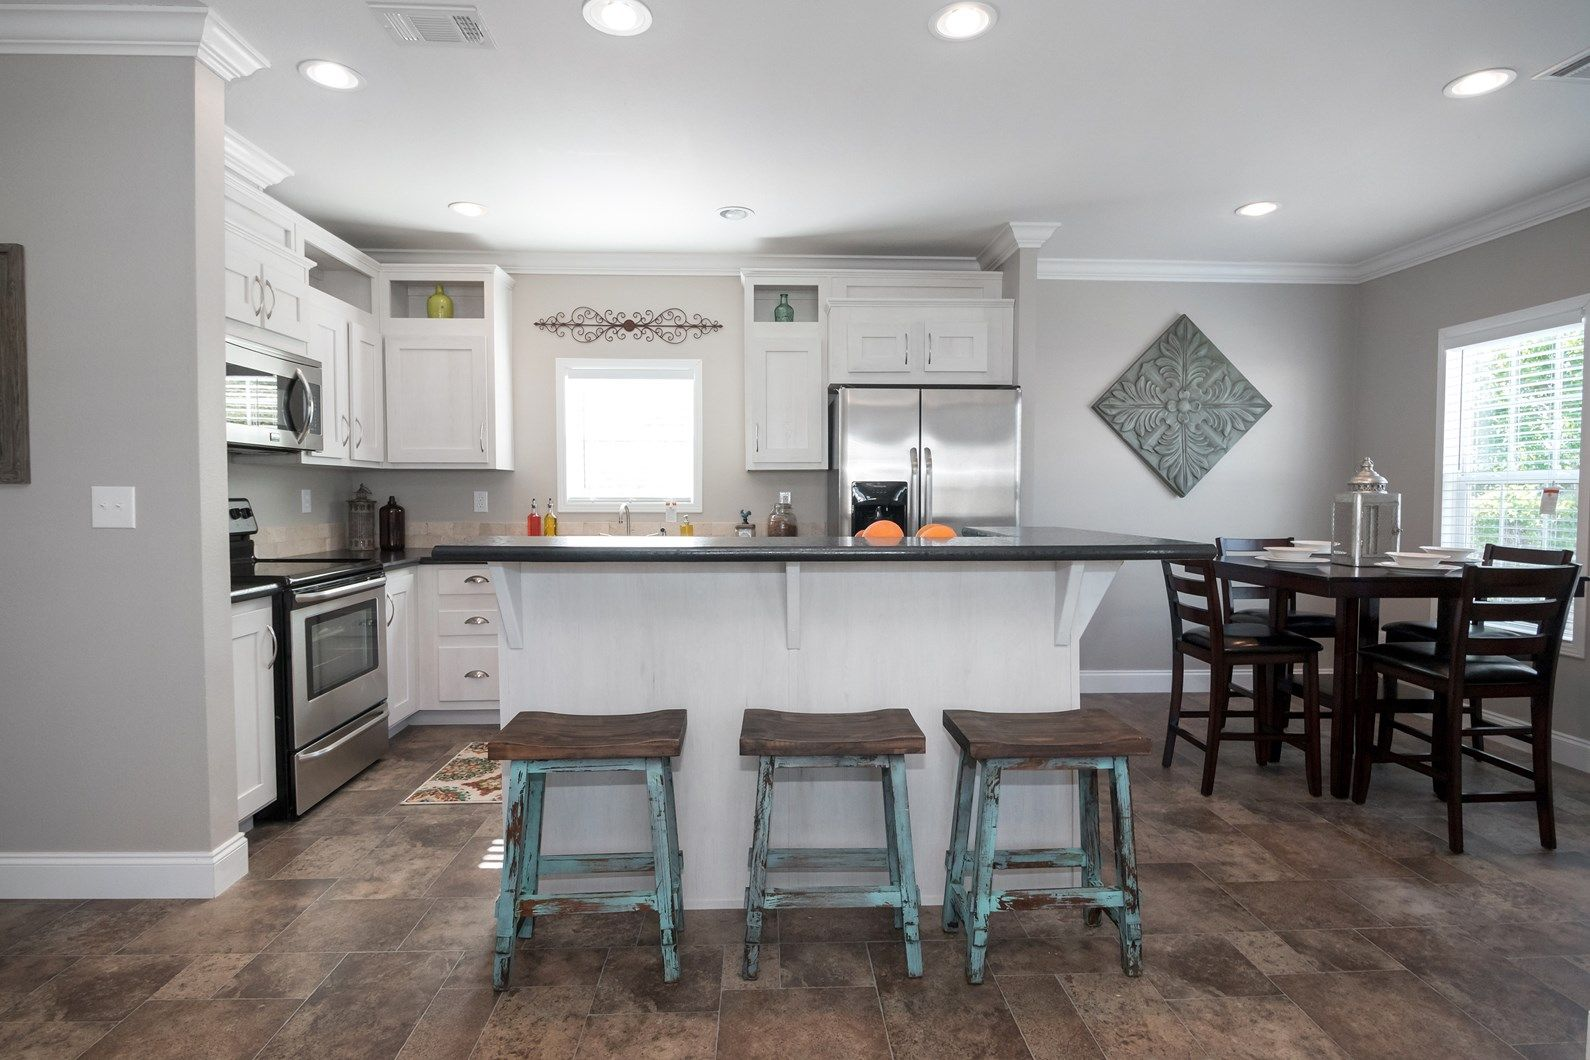 3D Tour Modular homes, Clayton homes, Home